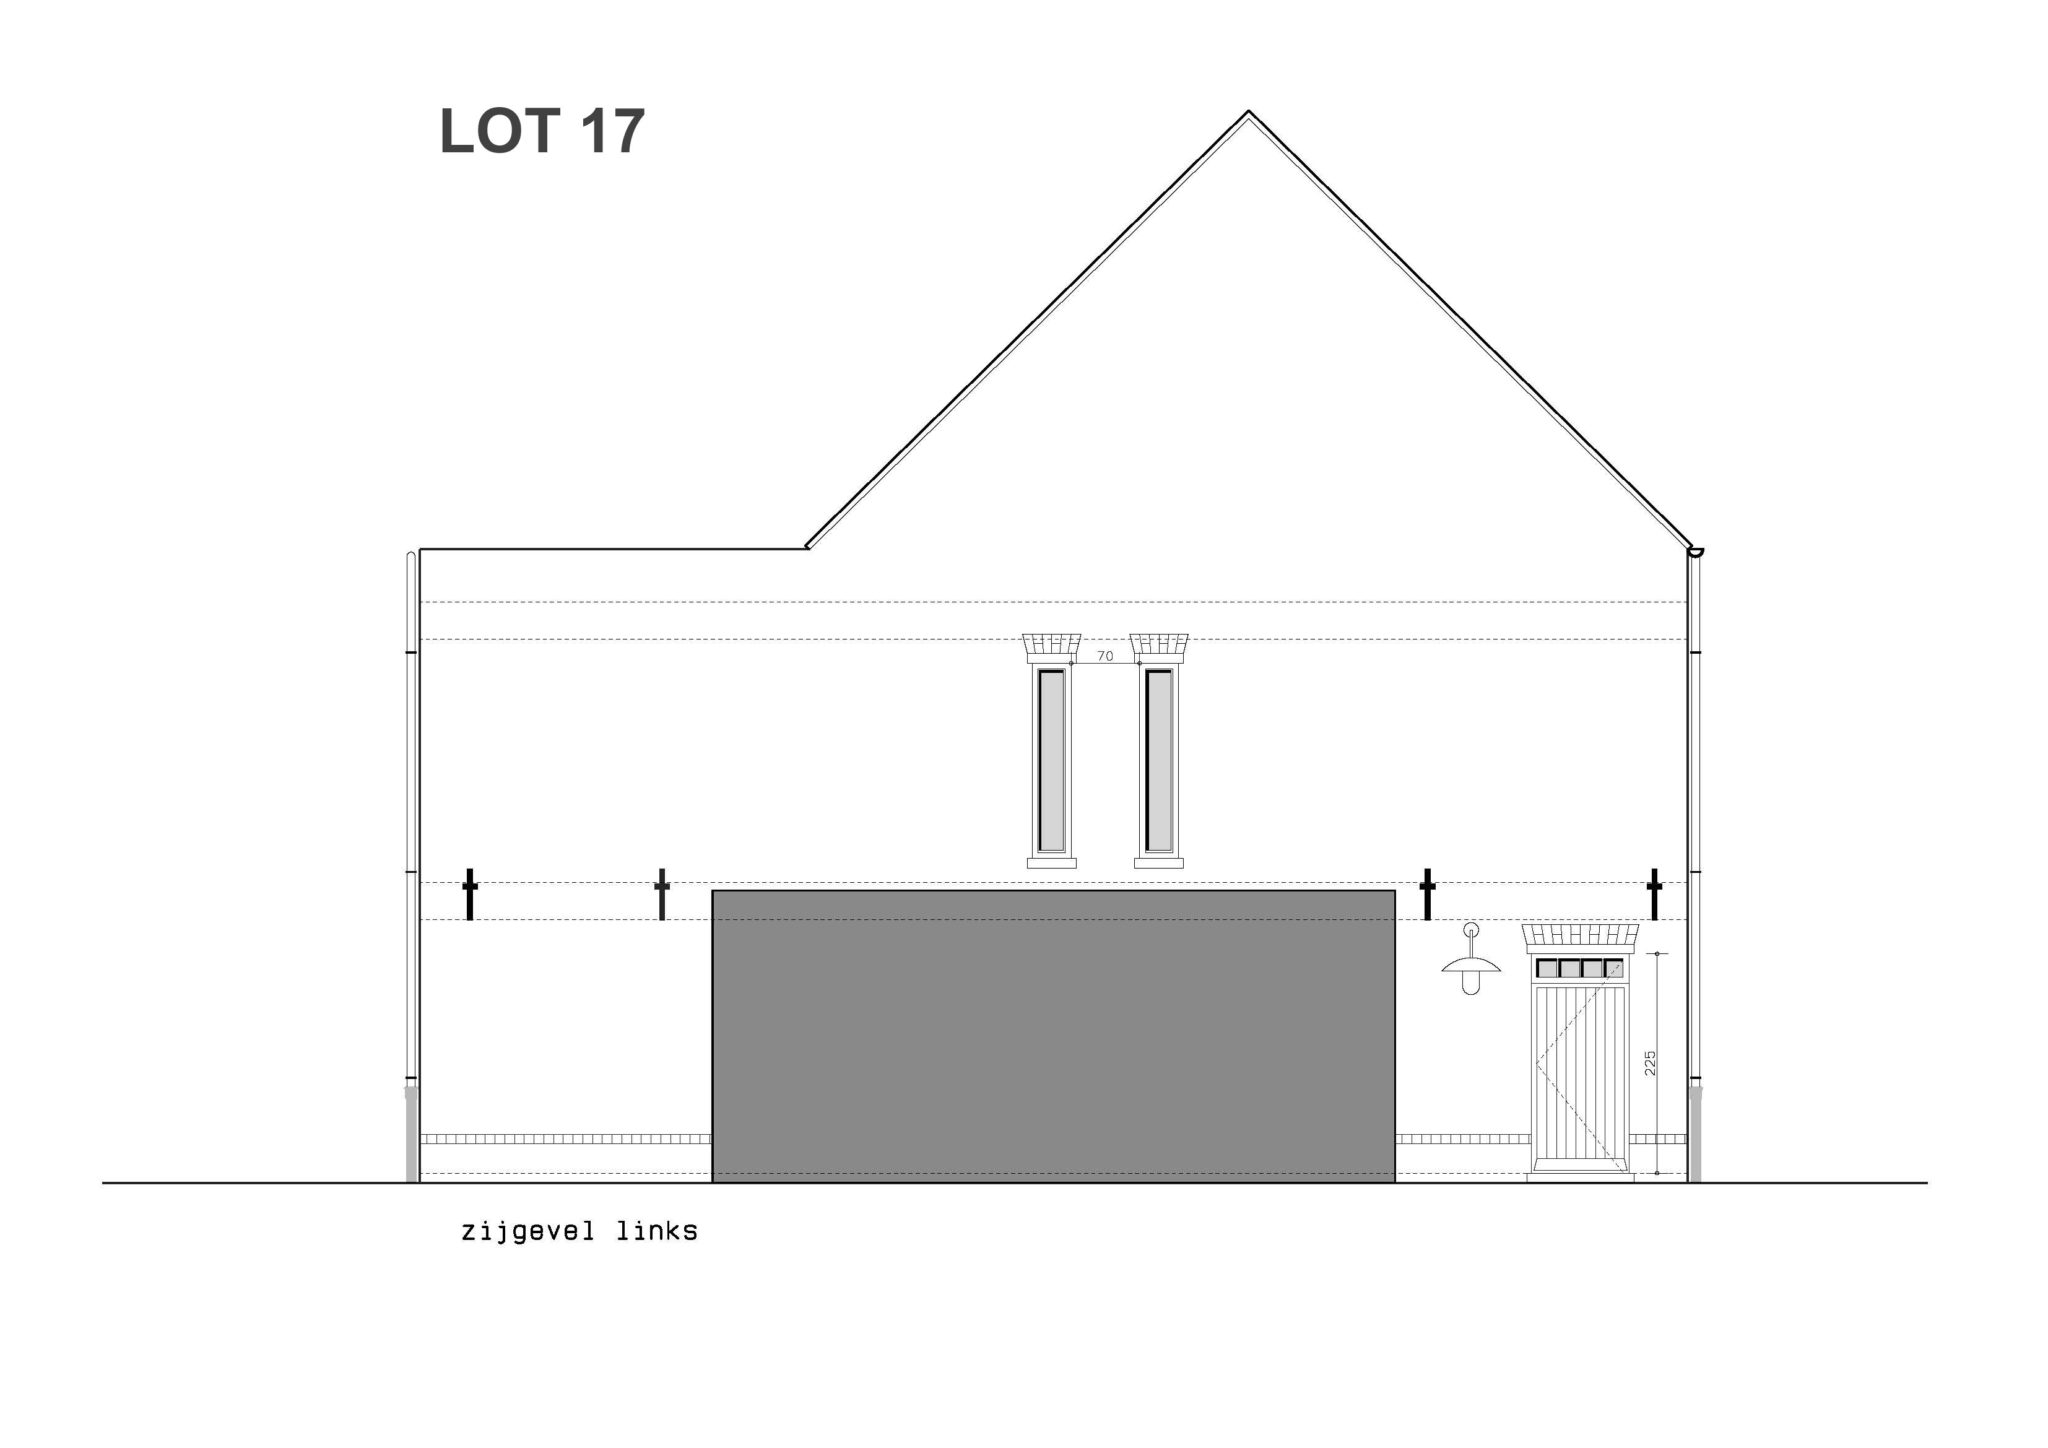 zijgevel-links-lot-17